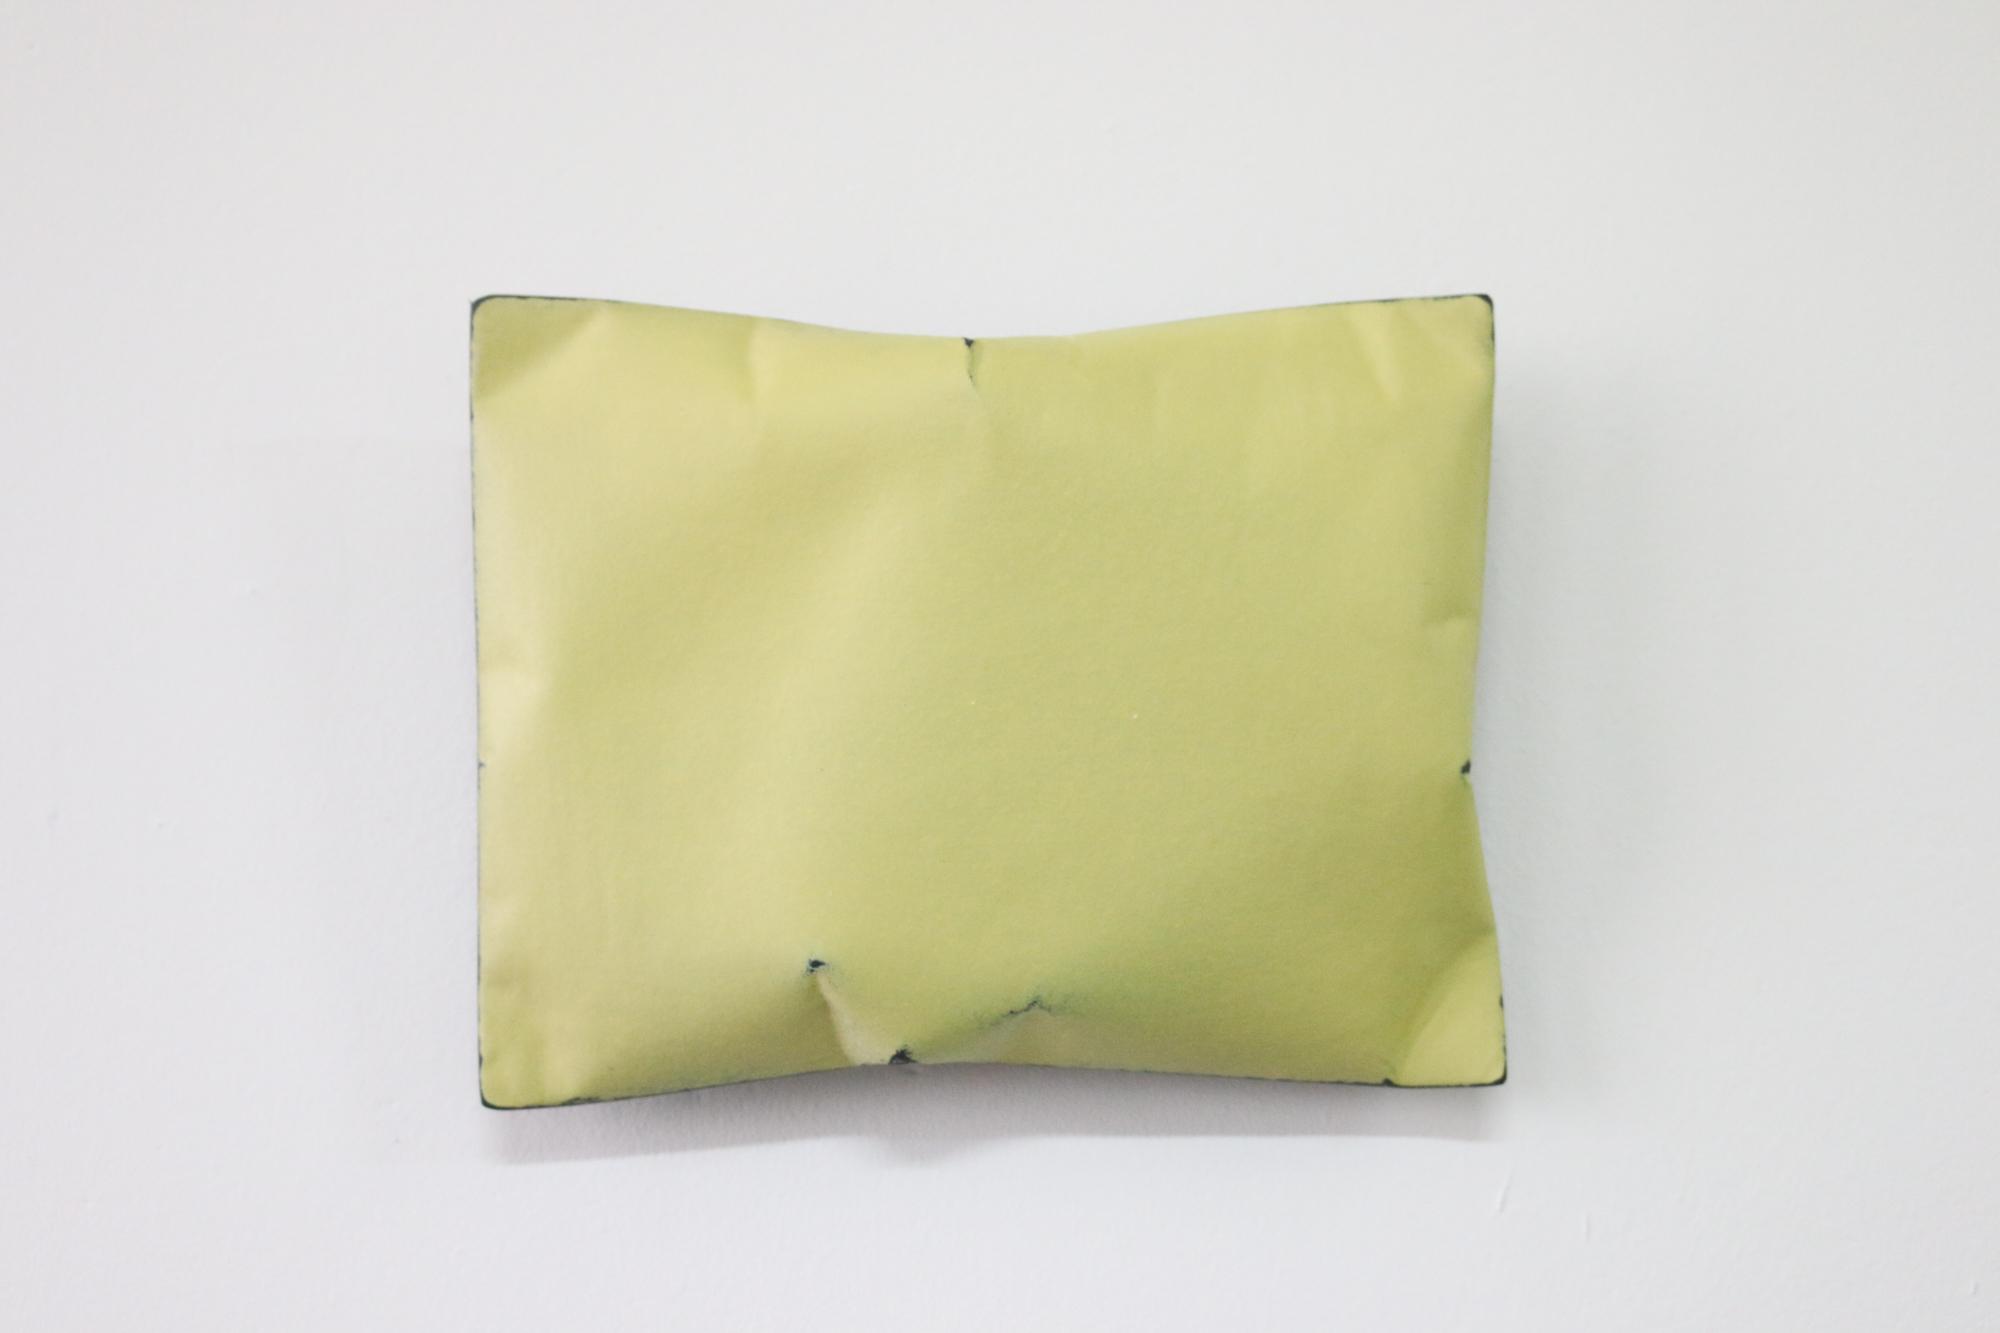 Johan De Wit, Untitled, 2018, Paper, Resin, Marble, Acrylic, 23 x 18 x 5.5 cm